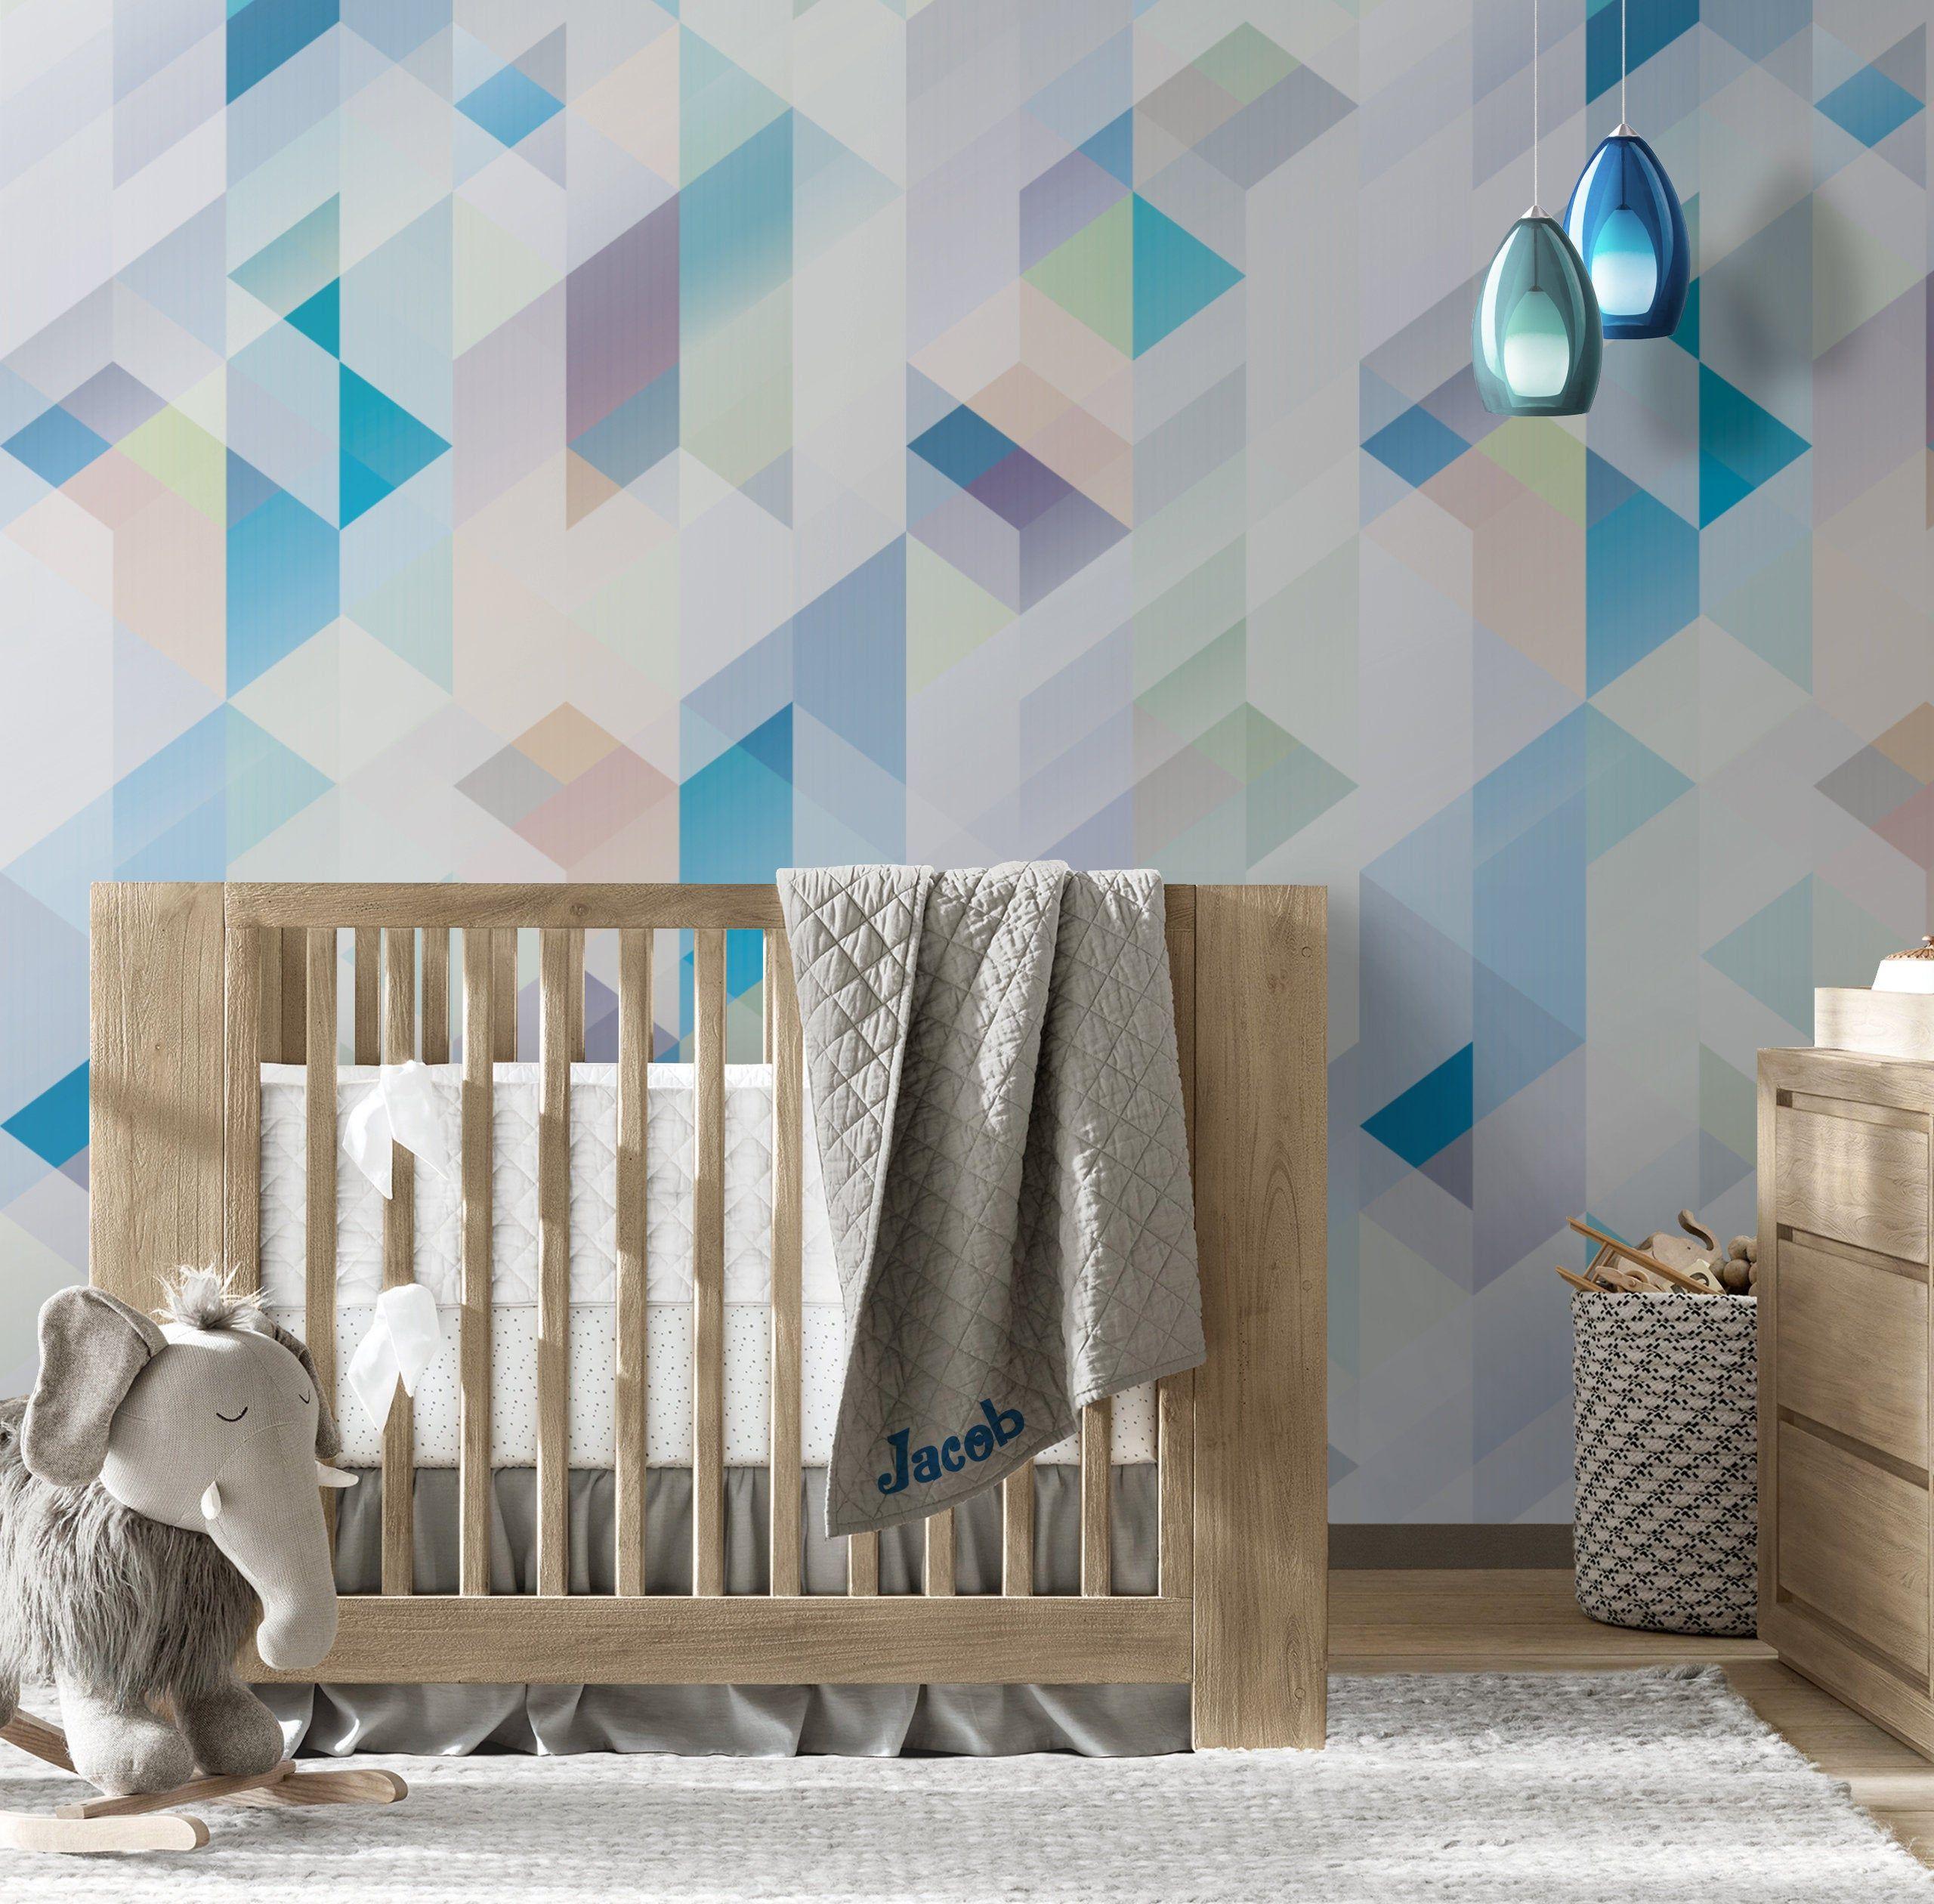 Geometric Pattern Repositionable Wallpaper Peel Stick Etsy In 2020 Geometric Pattern Wallpaper Textured Walls Geometric Pattern